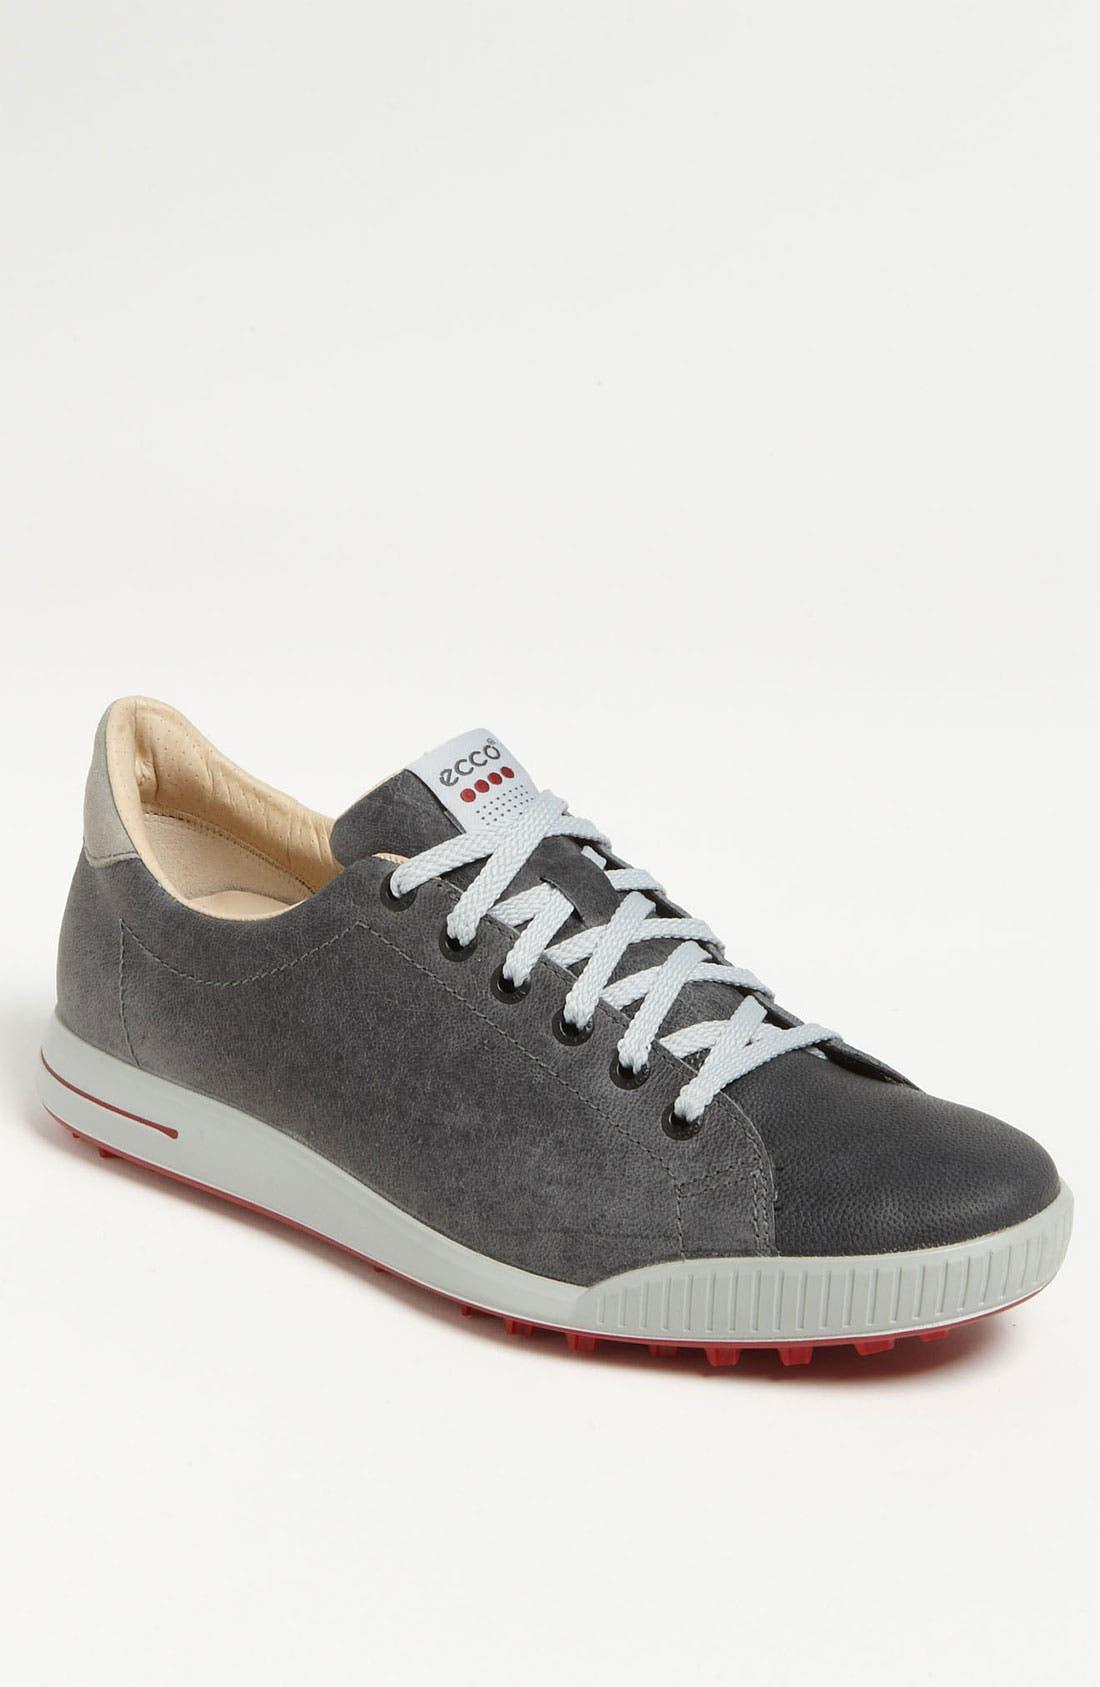 Main Image - ECCO 'Golf Street' Sneaker